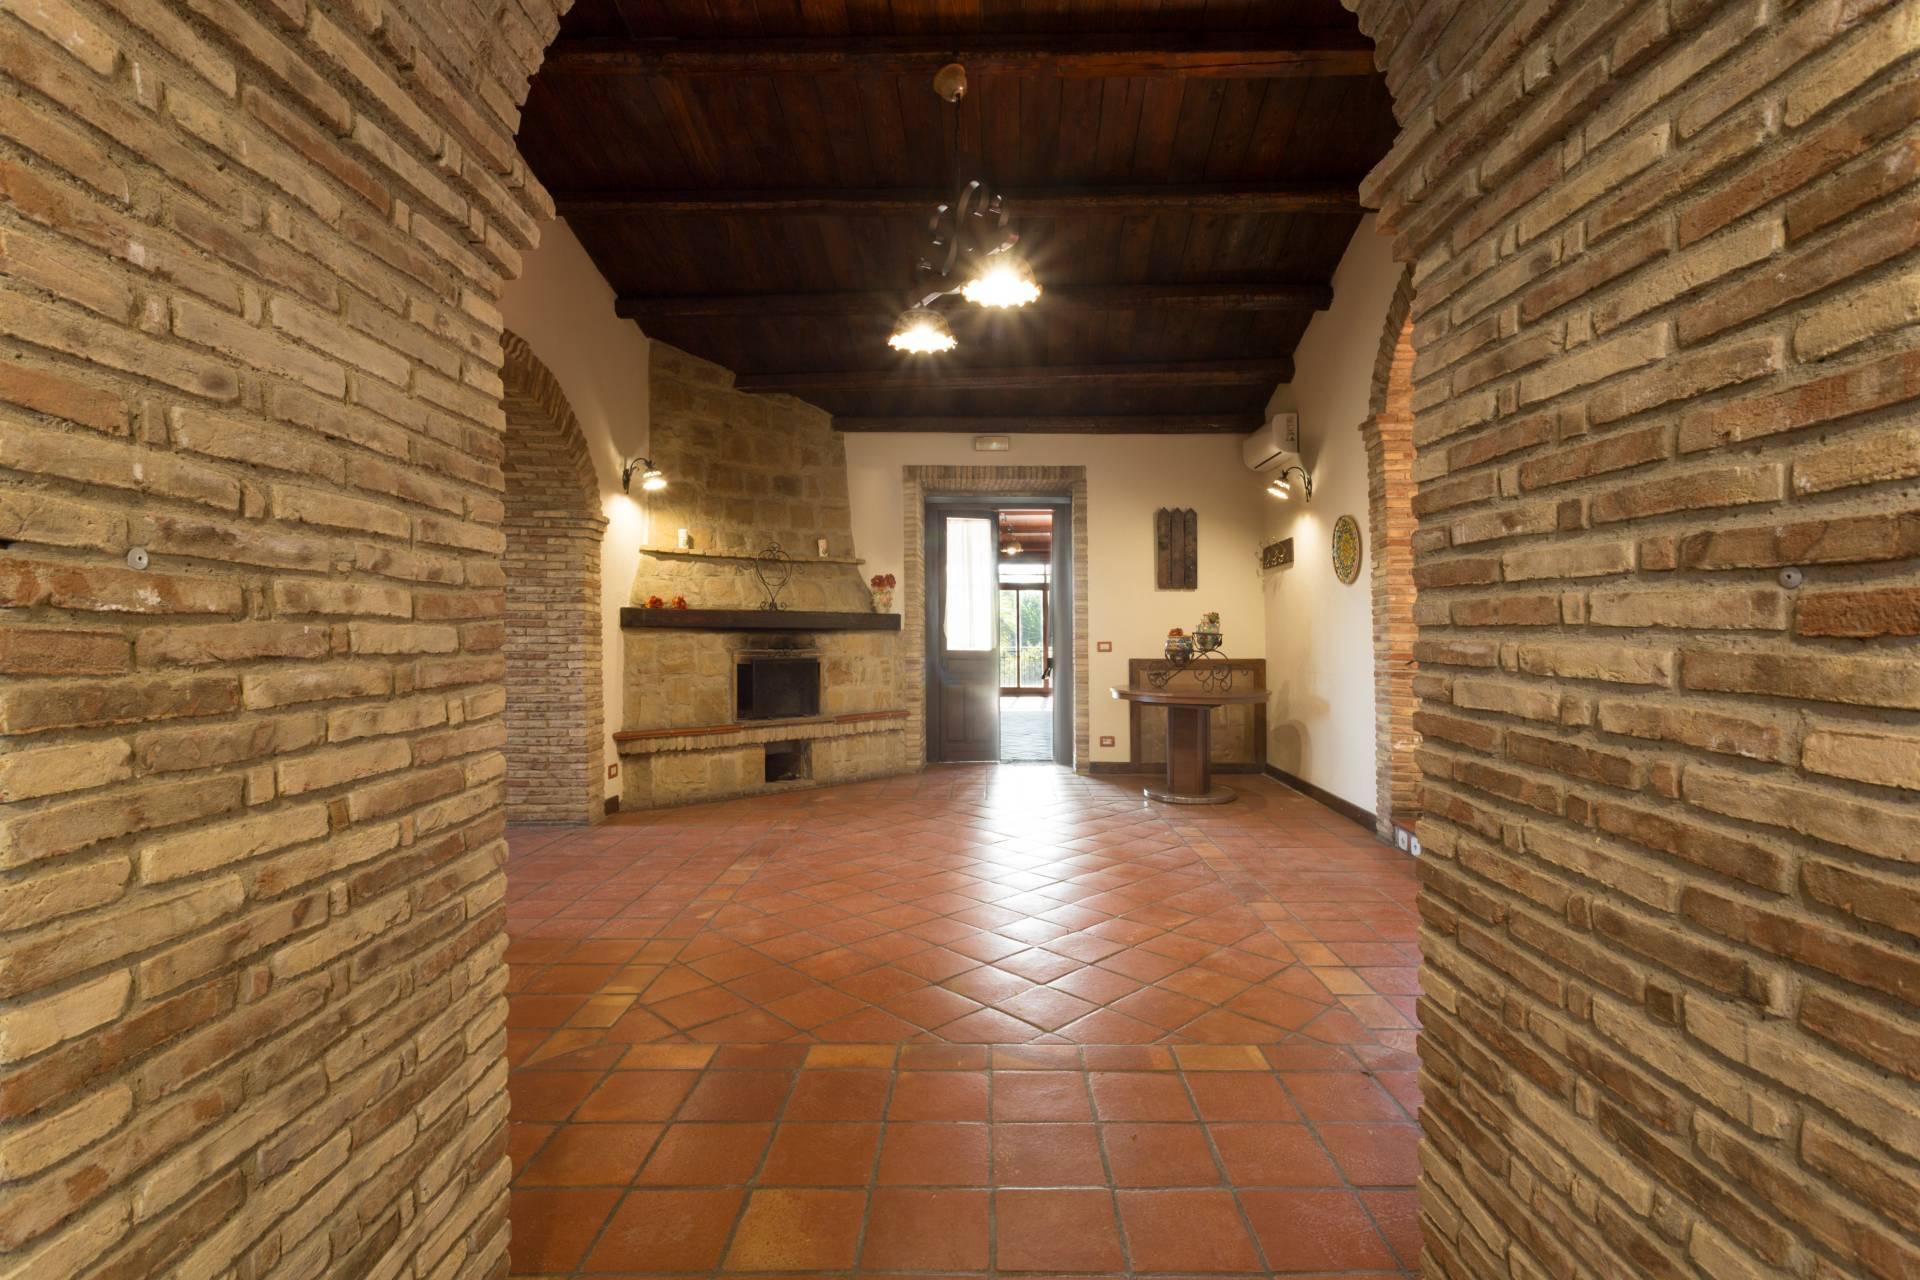 Villa in Vendita a Piazza Armerina: 5 locali, 550 mq - Foto 22